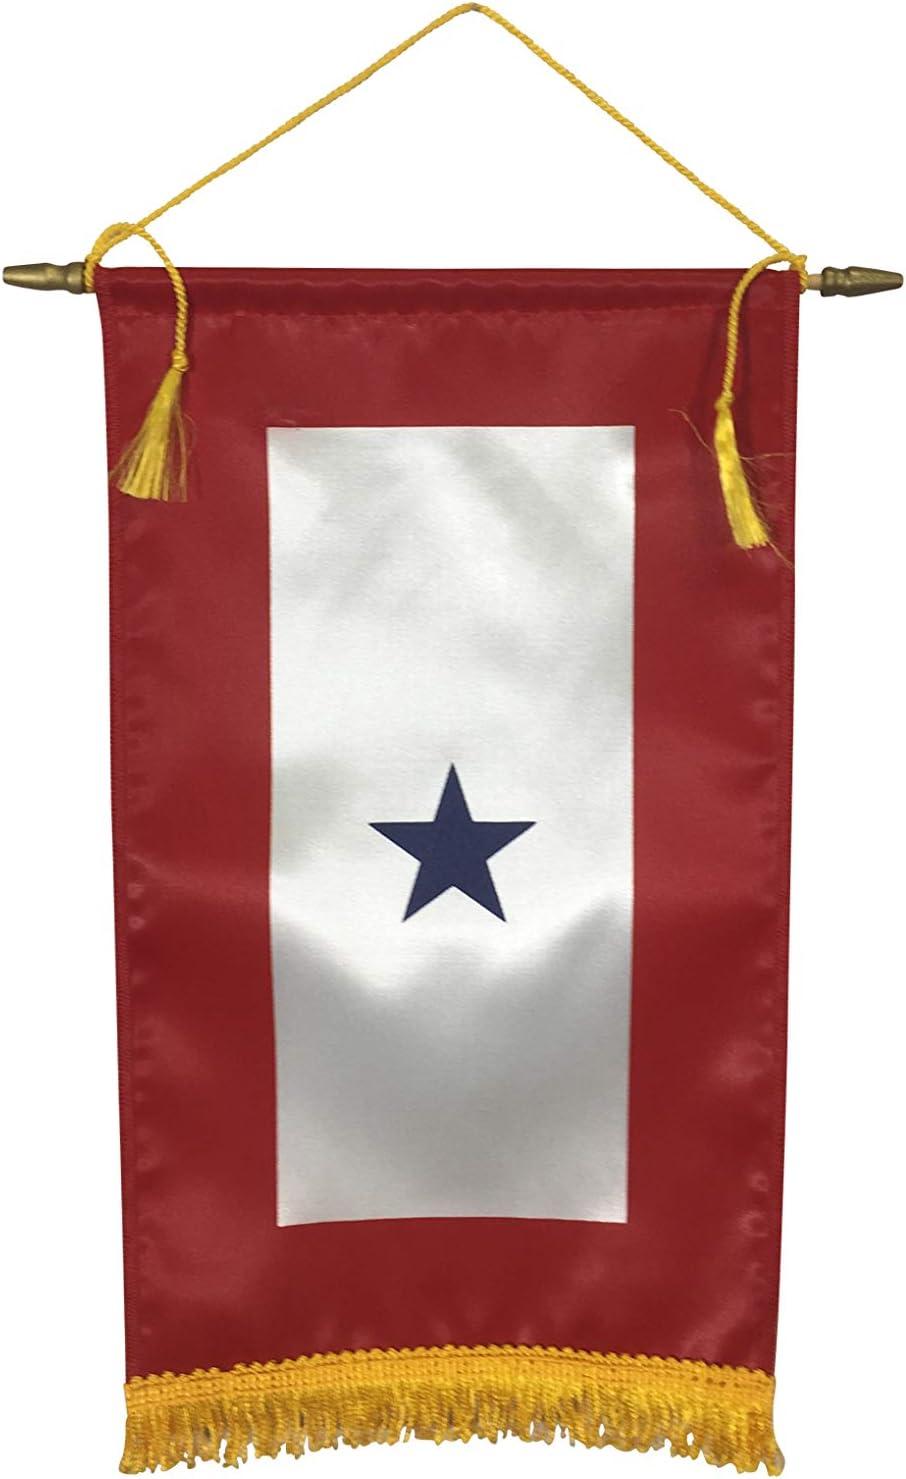 Gettysburg Flag Works 8x14 1 Sales results No. 1 Baltimore Mall Indoor Star Satin Blue Service